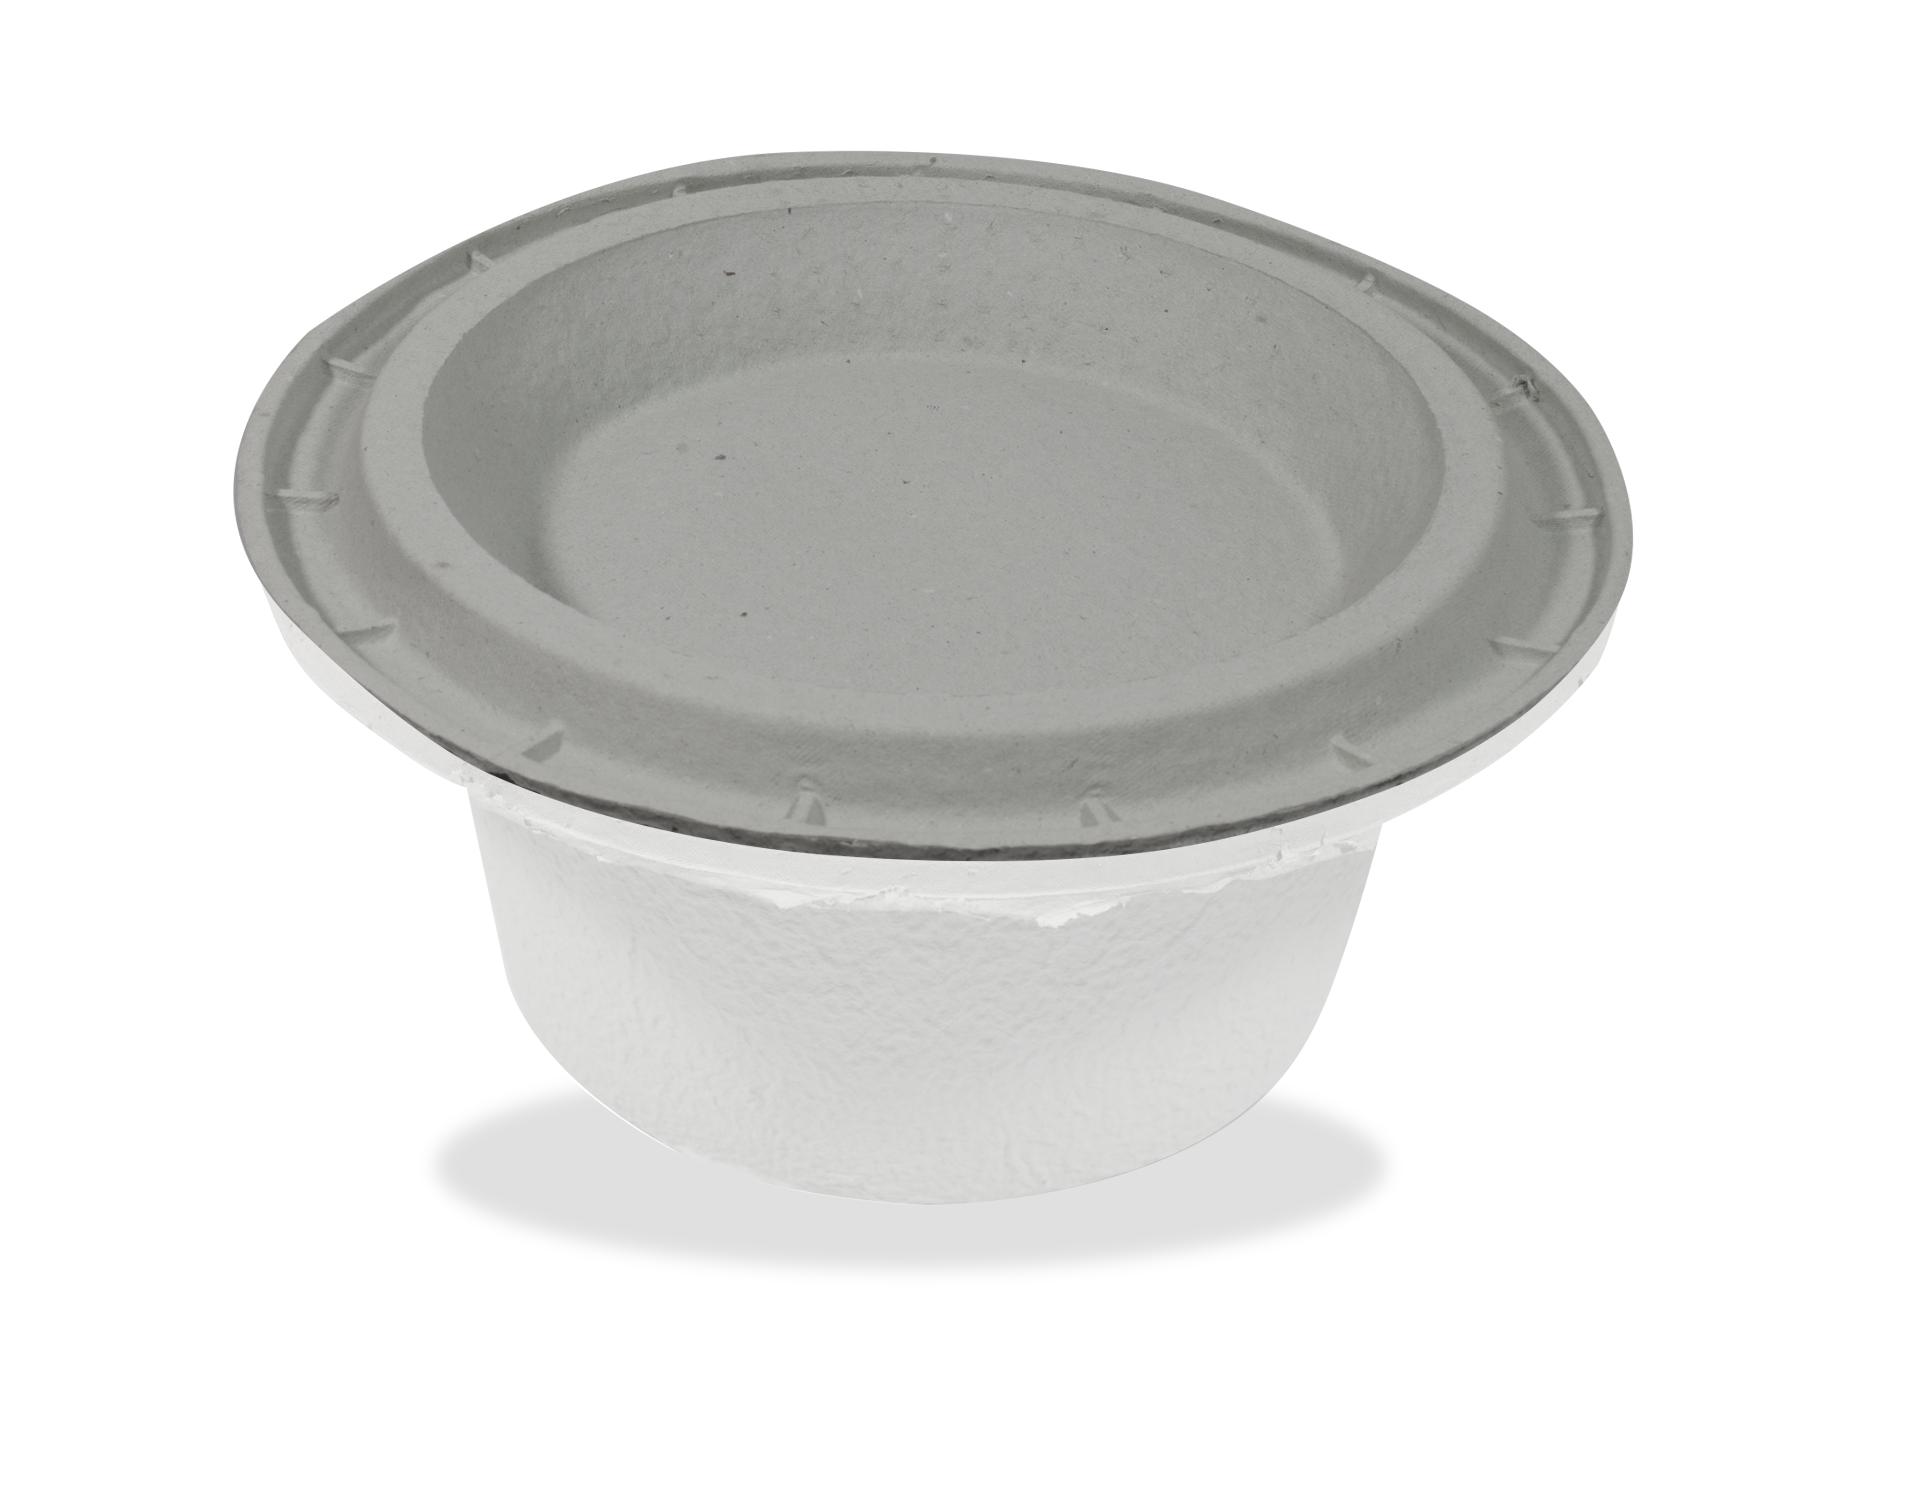 R-FIN Deckel für Toilettenstuhltopf NT-CB 1